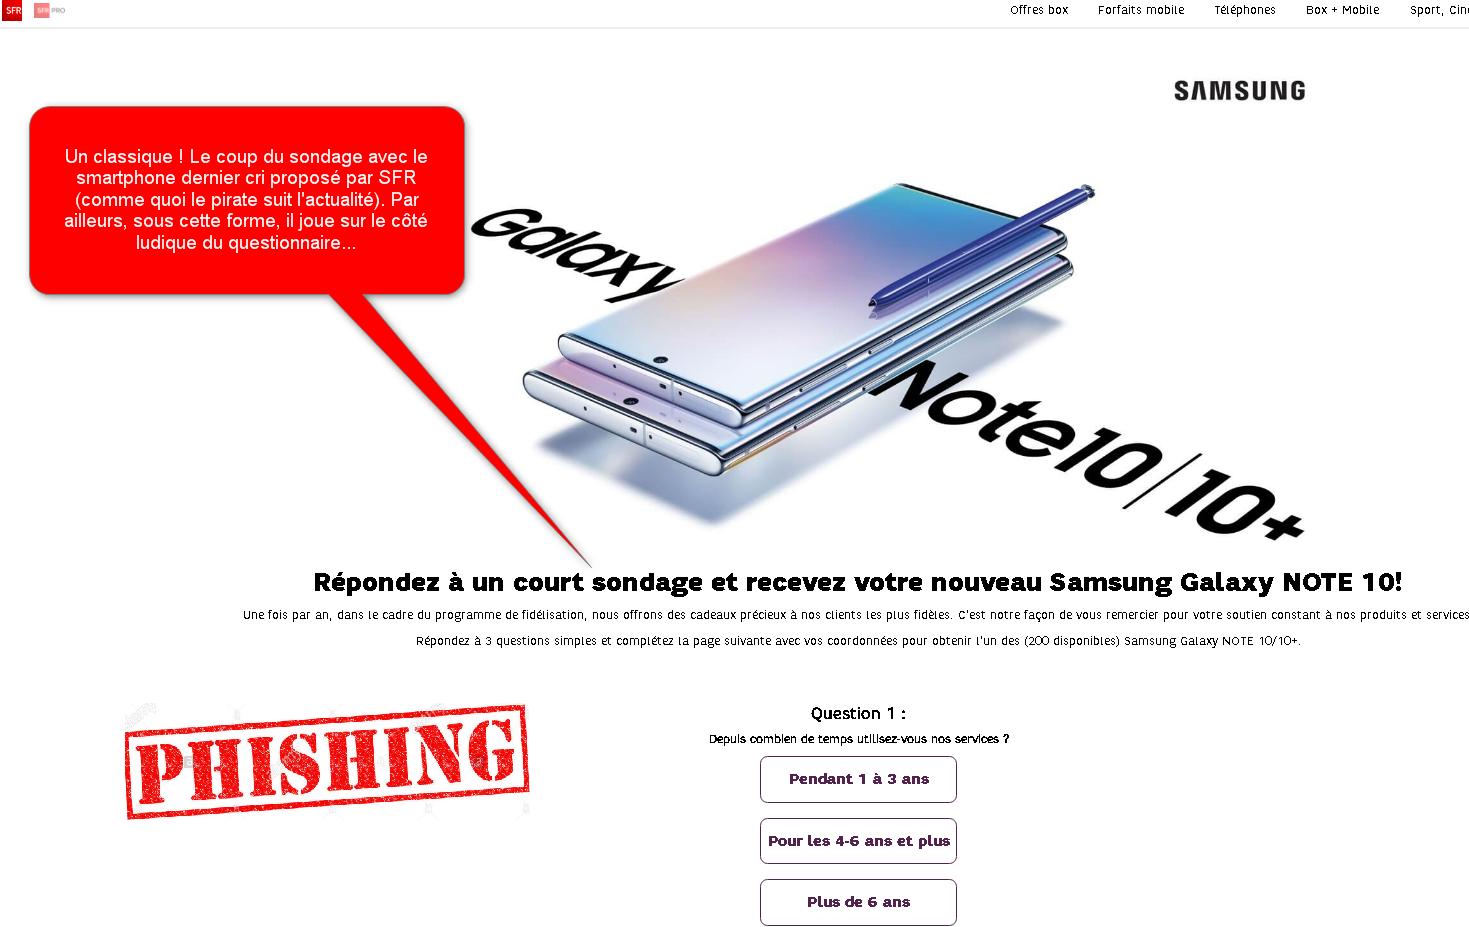 SFR_250919_BLOG-SECURITE-Phishing-Sept-008c.png